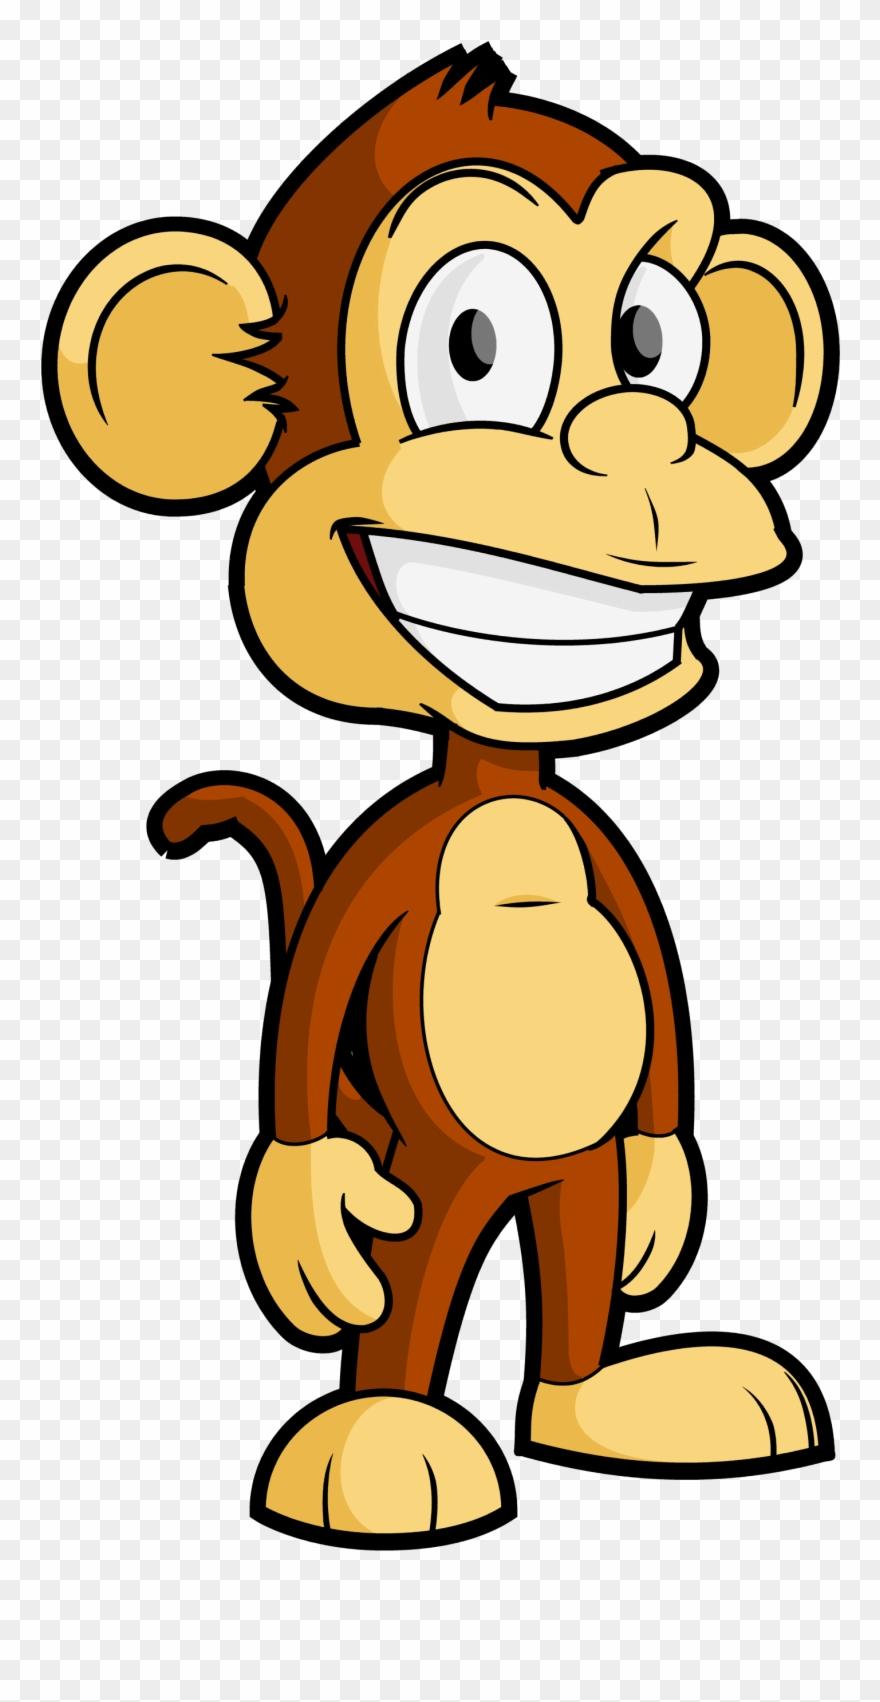 Free Cartoon Monkey Vector Clip Art.